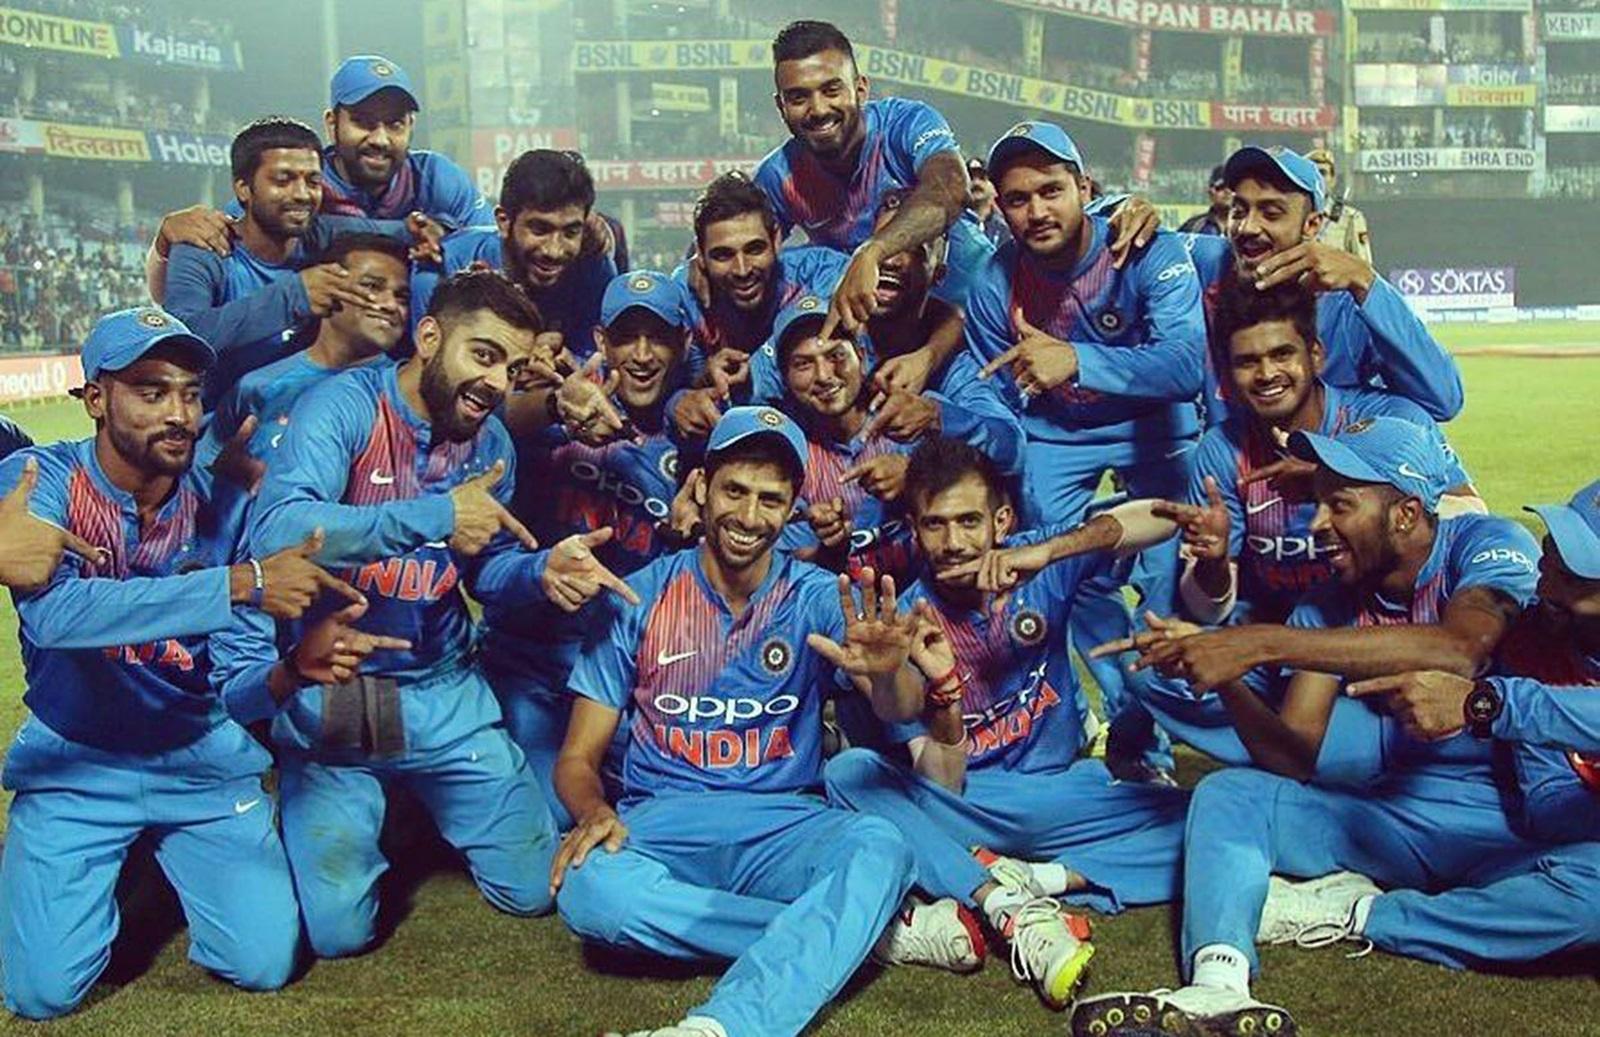 Pakistan's delight at India T20 victory | cricket com au